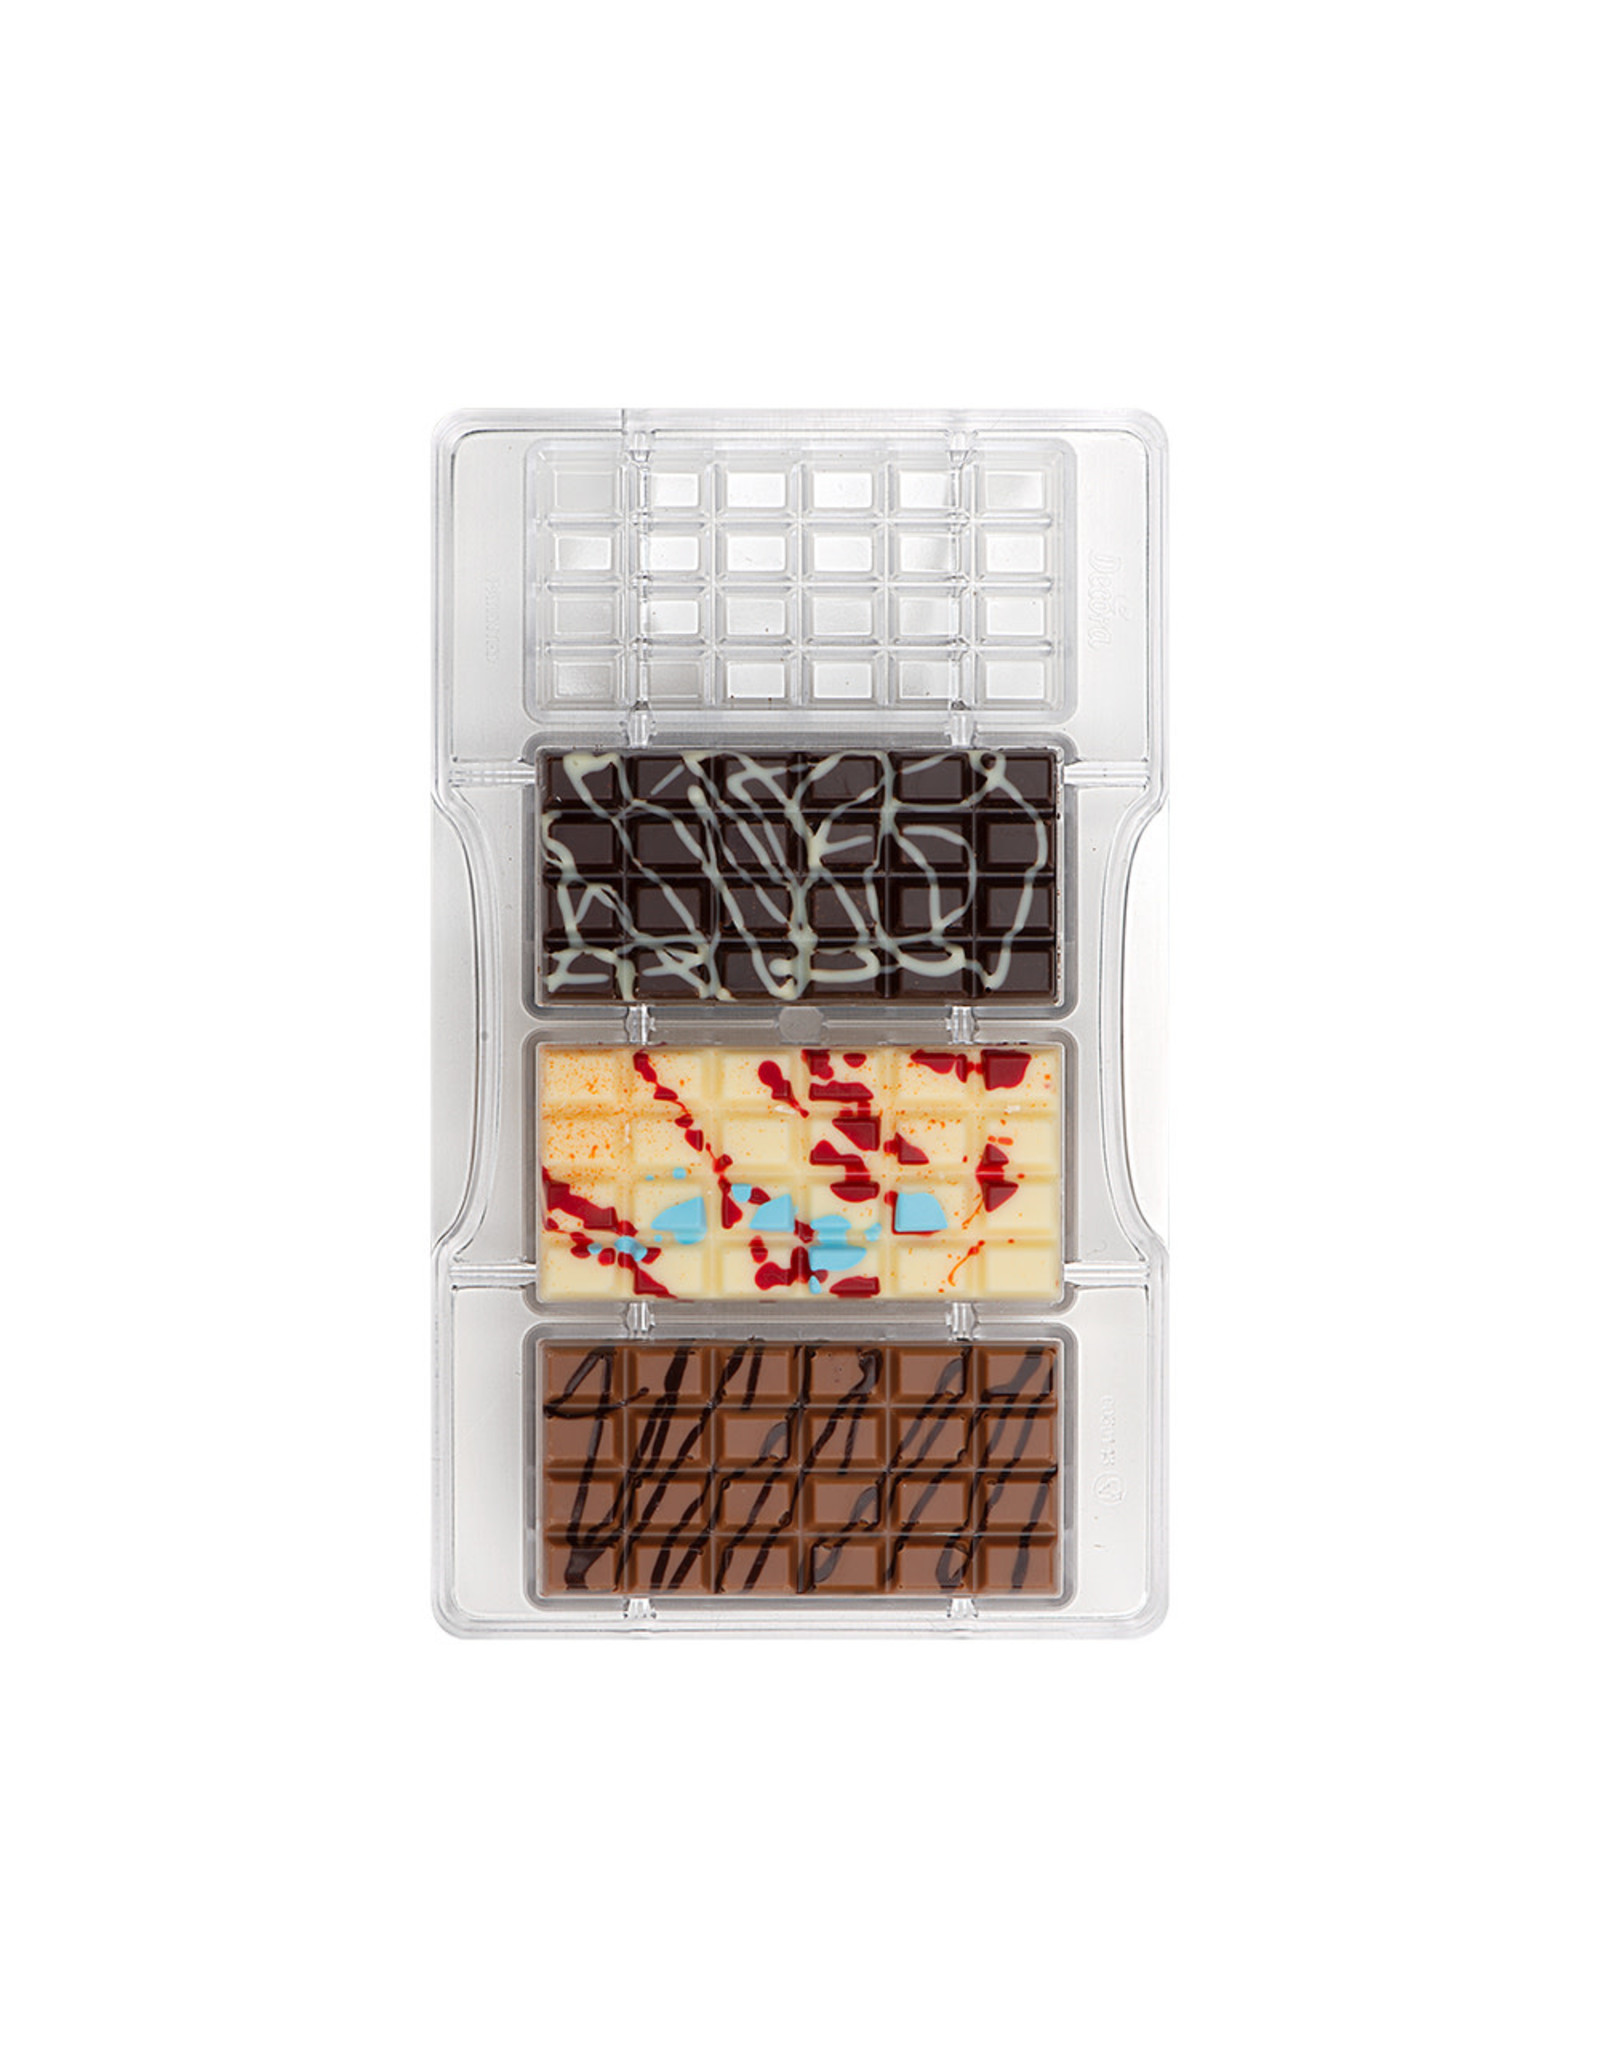 Decora Chocoladevorm polycarbonaat 4 repen